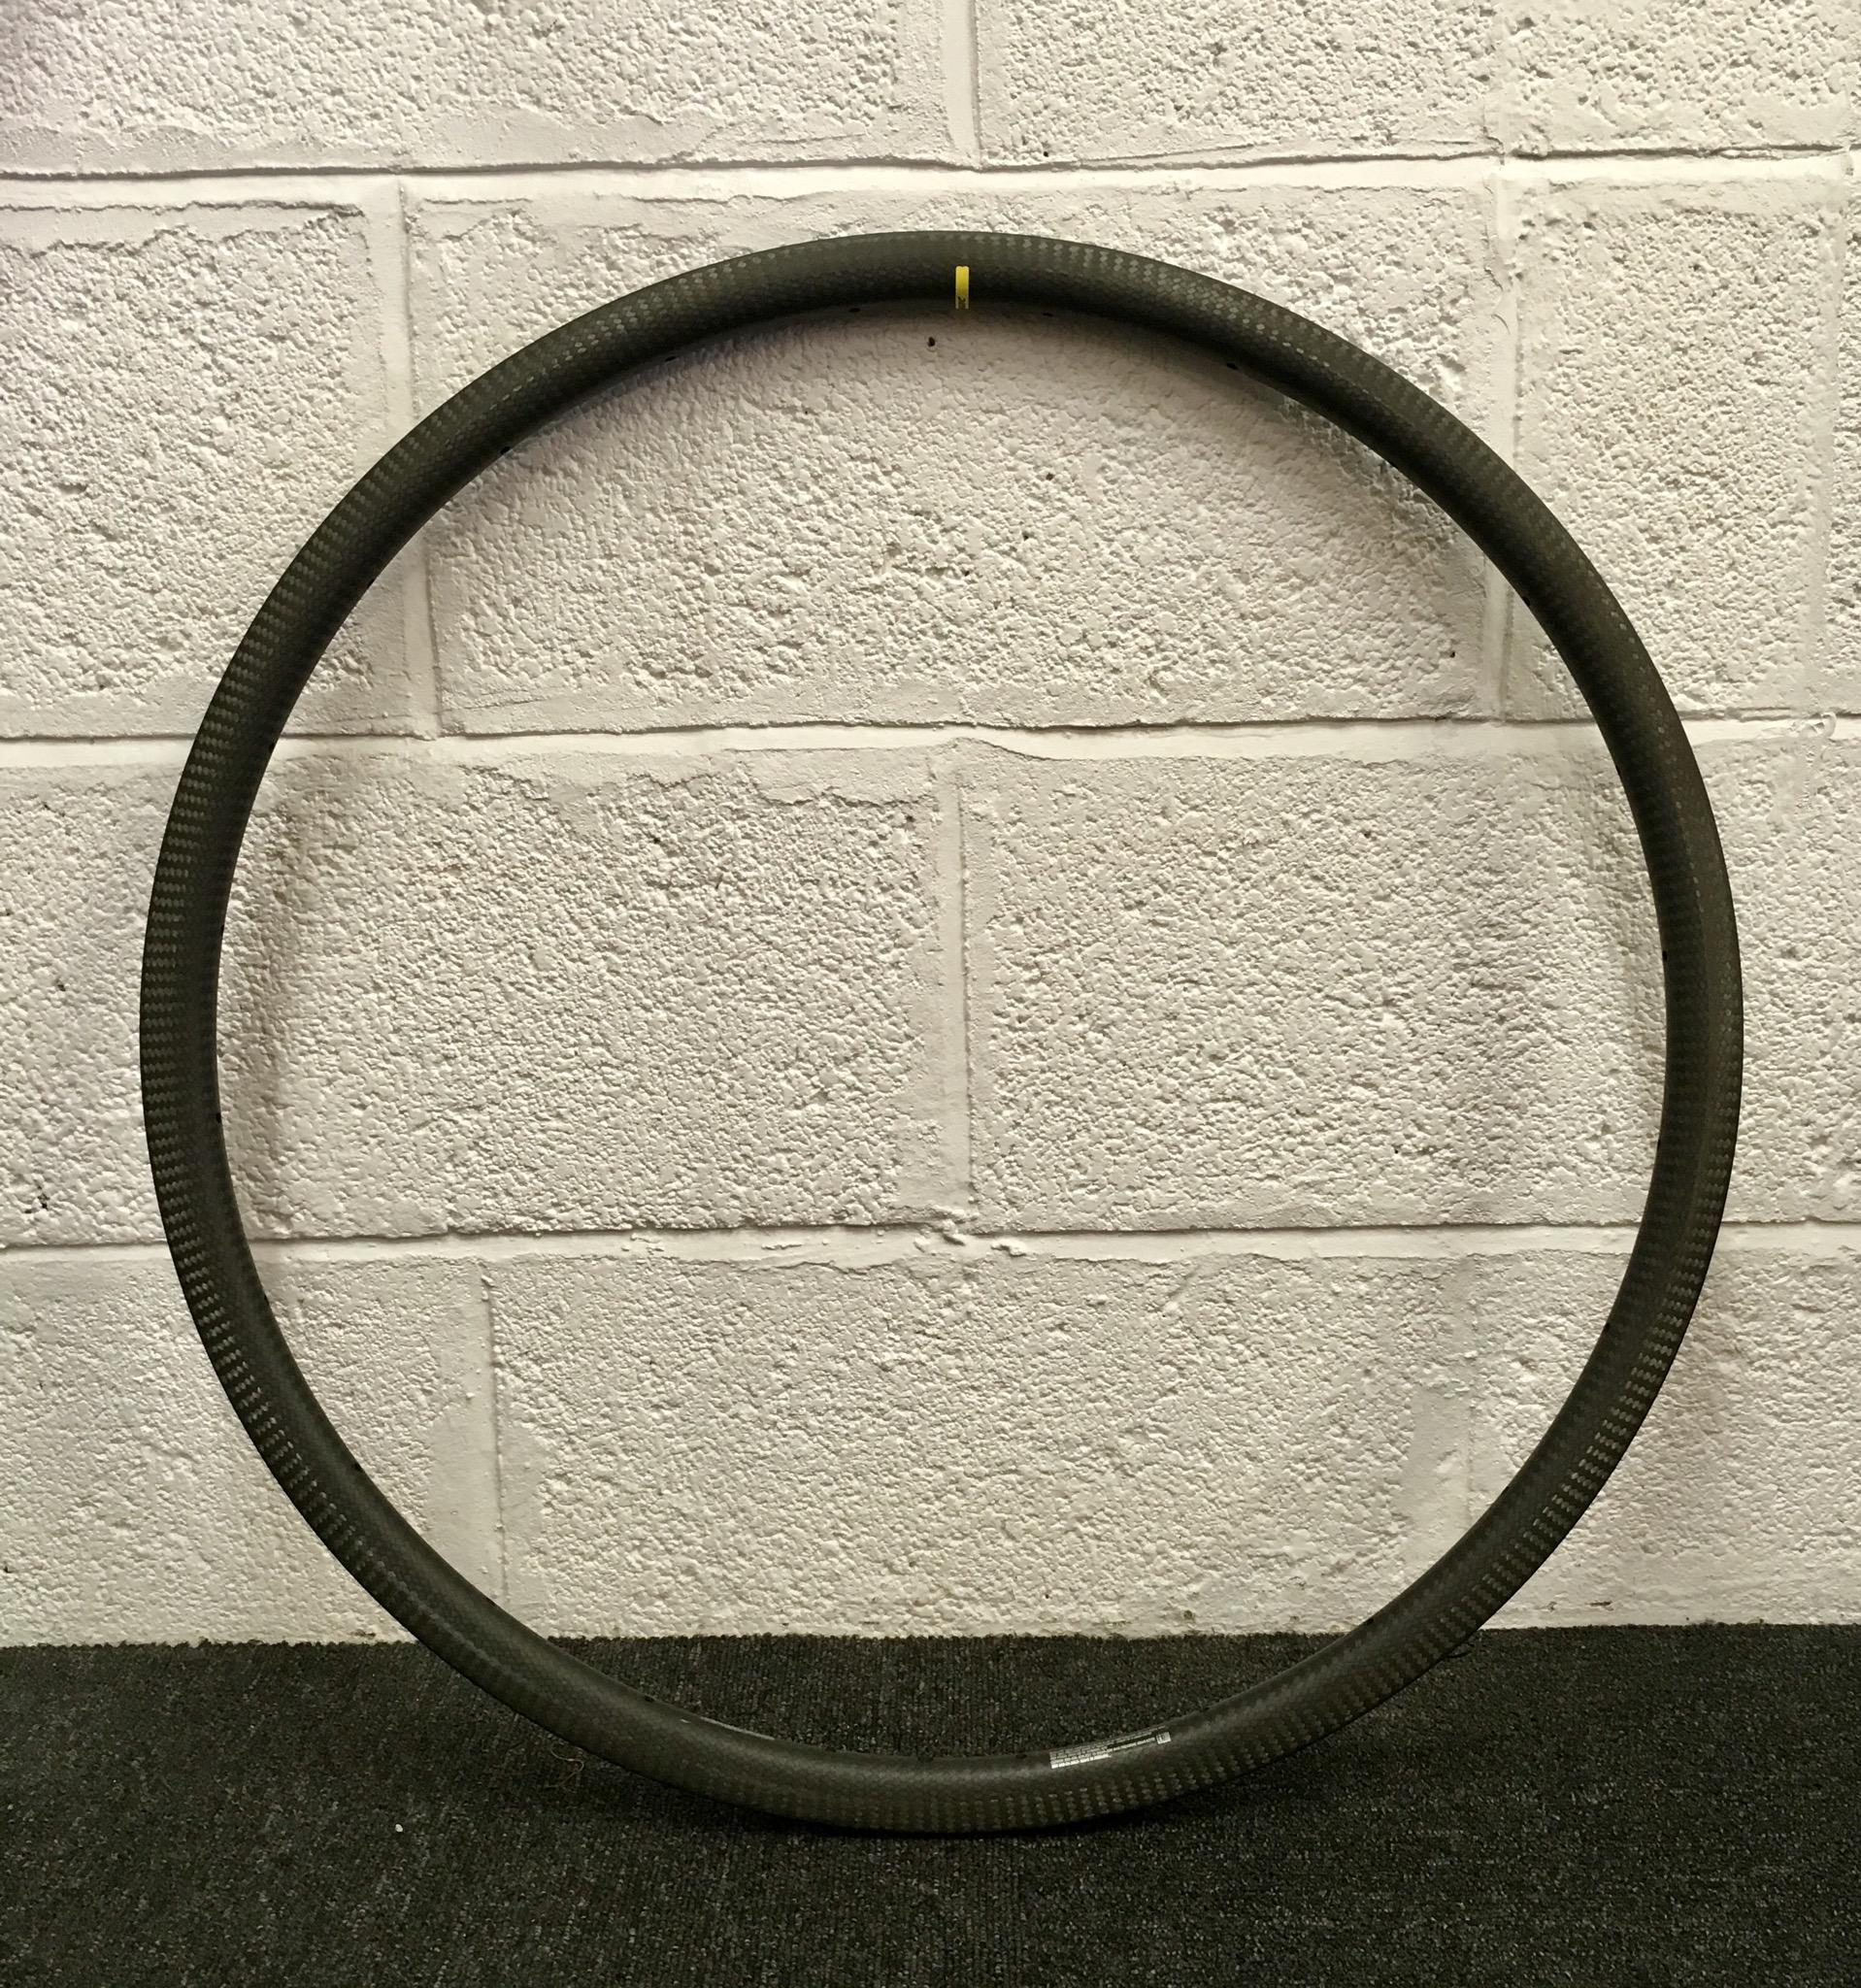 Mavic Open PRO Carbon ( used in the Ksyrium pro Carbon sl wheelset)  Rim weight 410g  Rim height 25mm  Cost £545 each rim